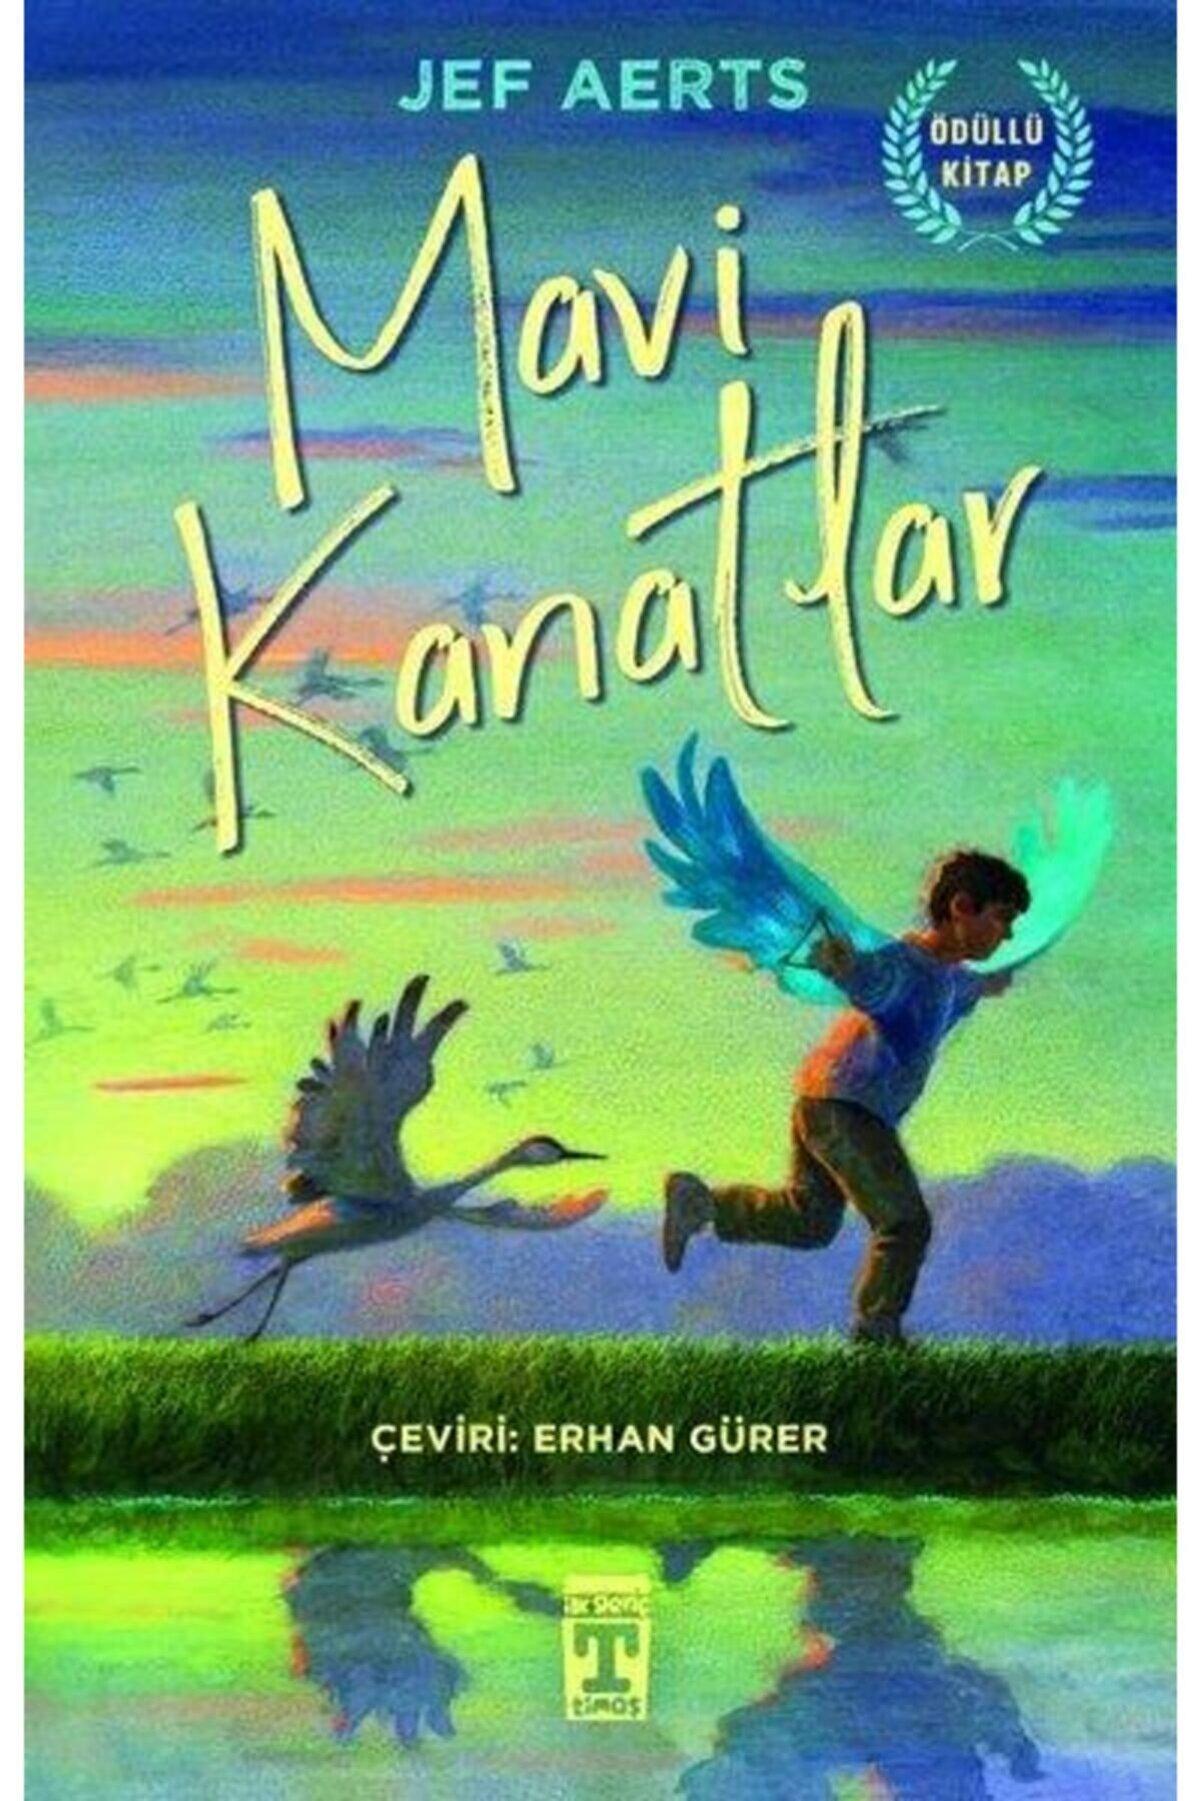 Genç Timaş Mavi Kanatlar - Jef Aerts - Ilk Genç Timaş Yayınları